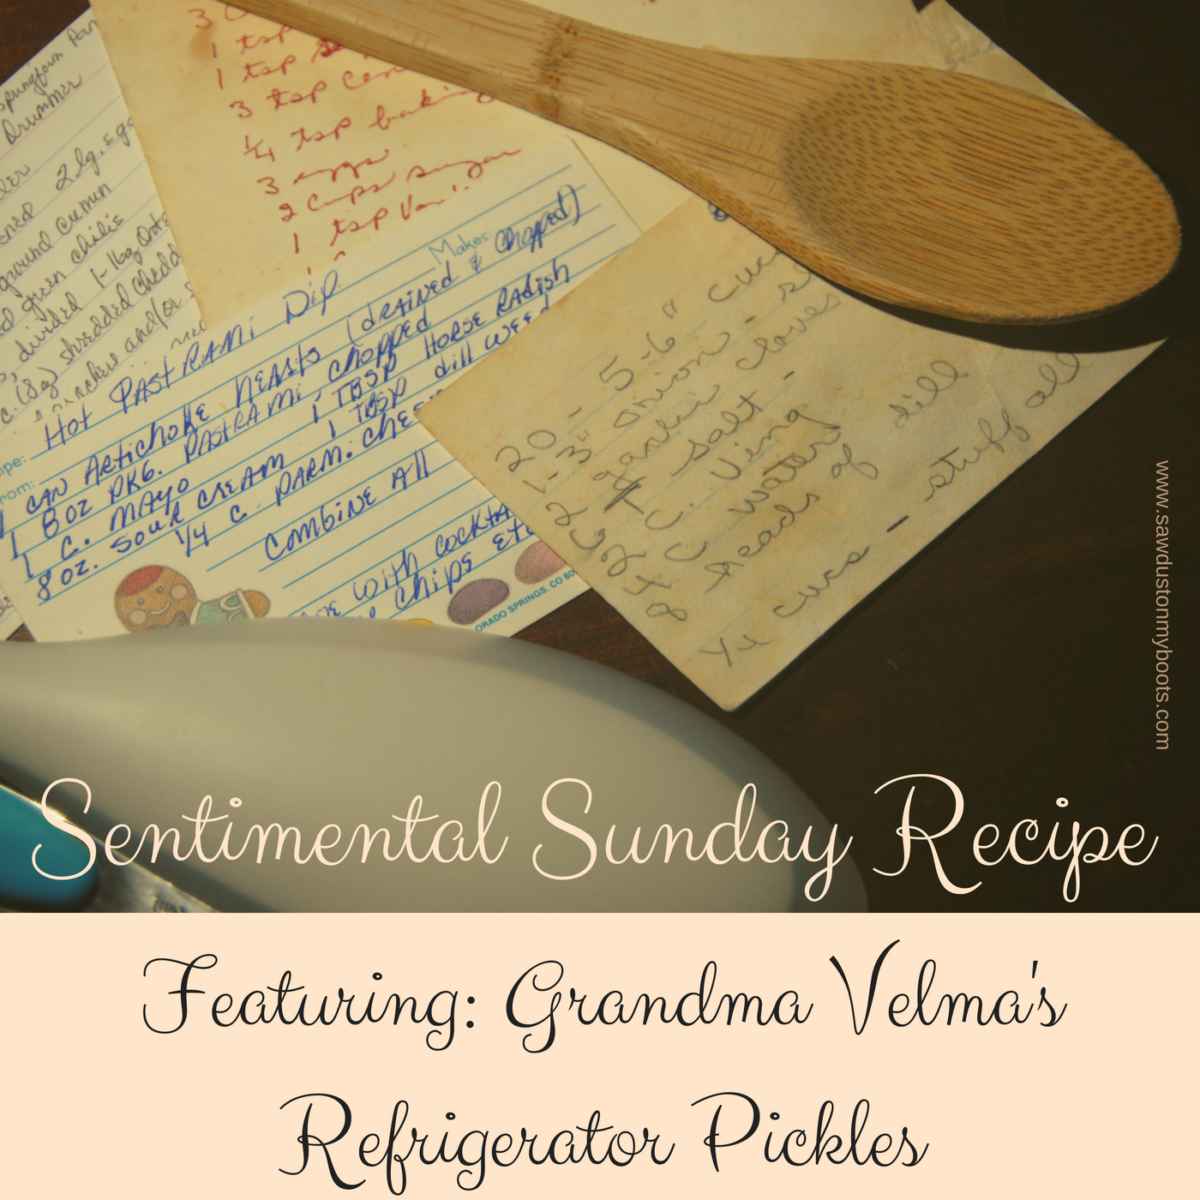 Sunday Sentimental Recipe: Grandma Velma's Refrigerator Pickles